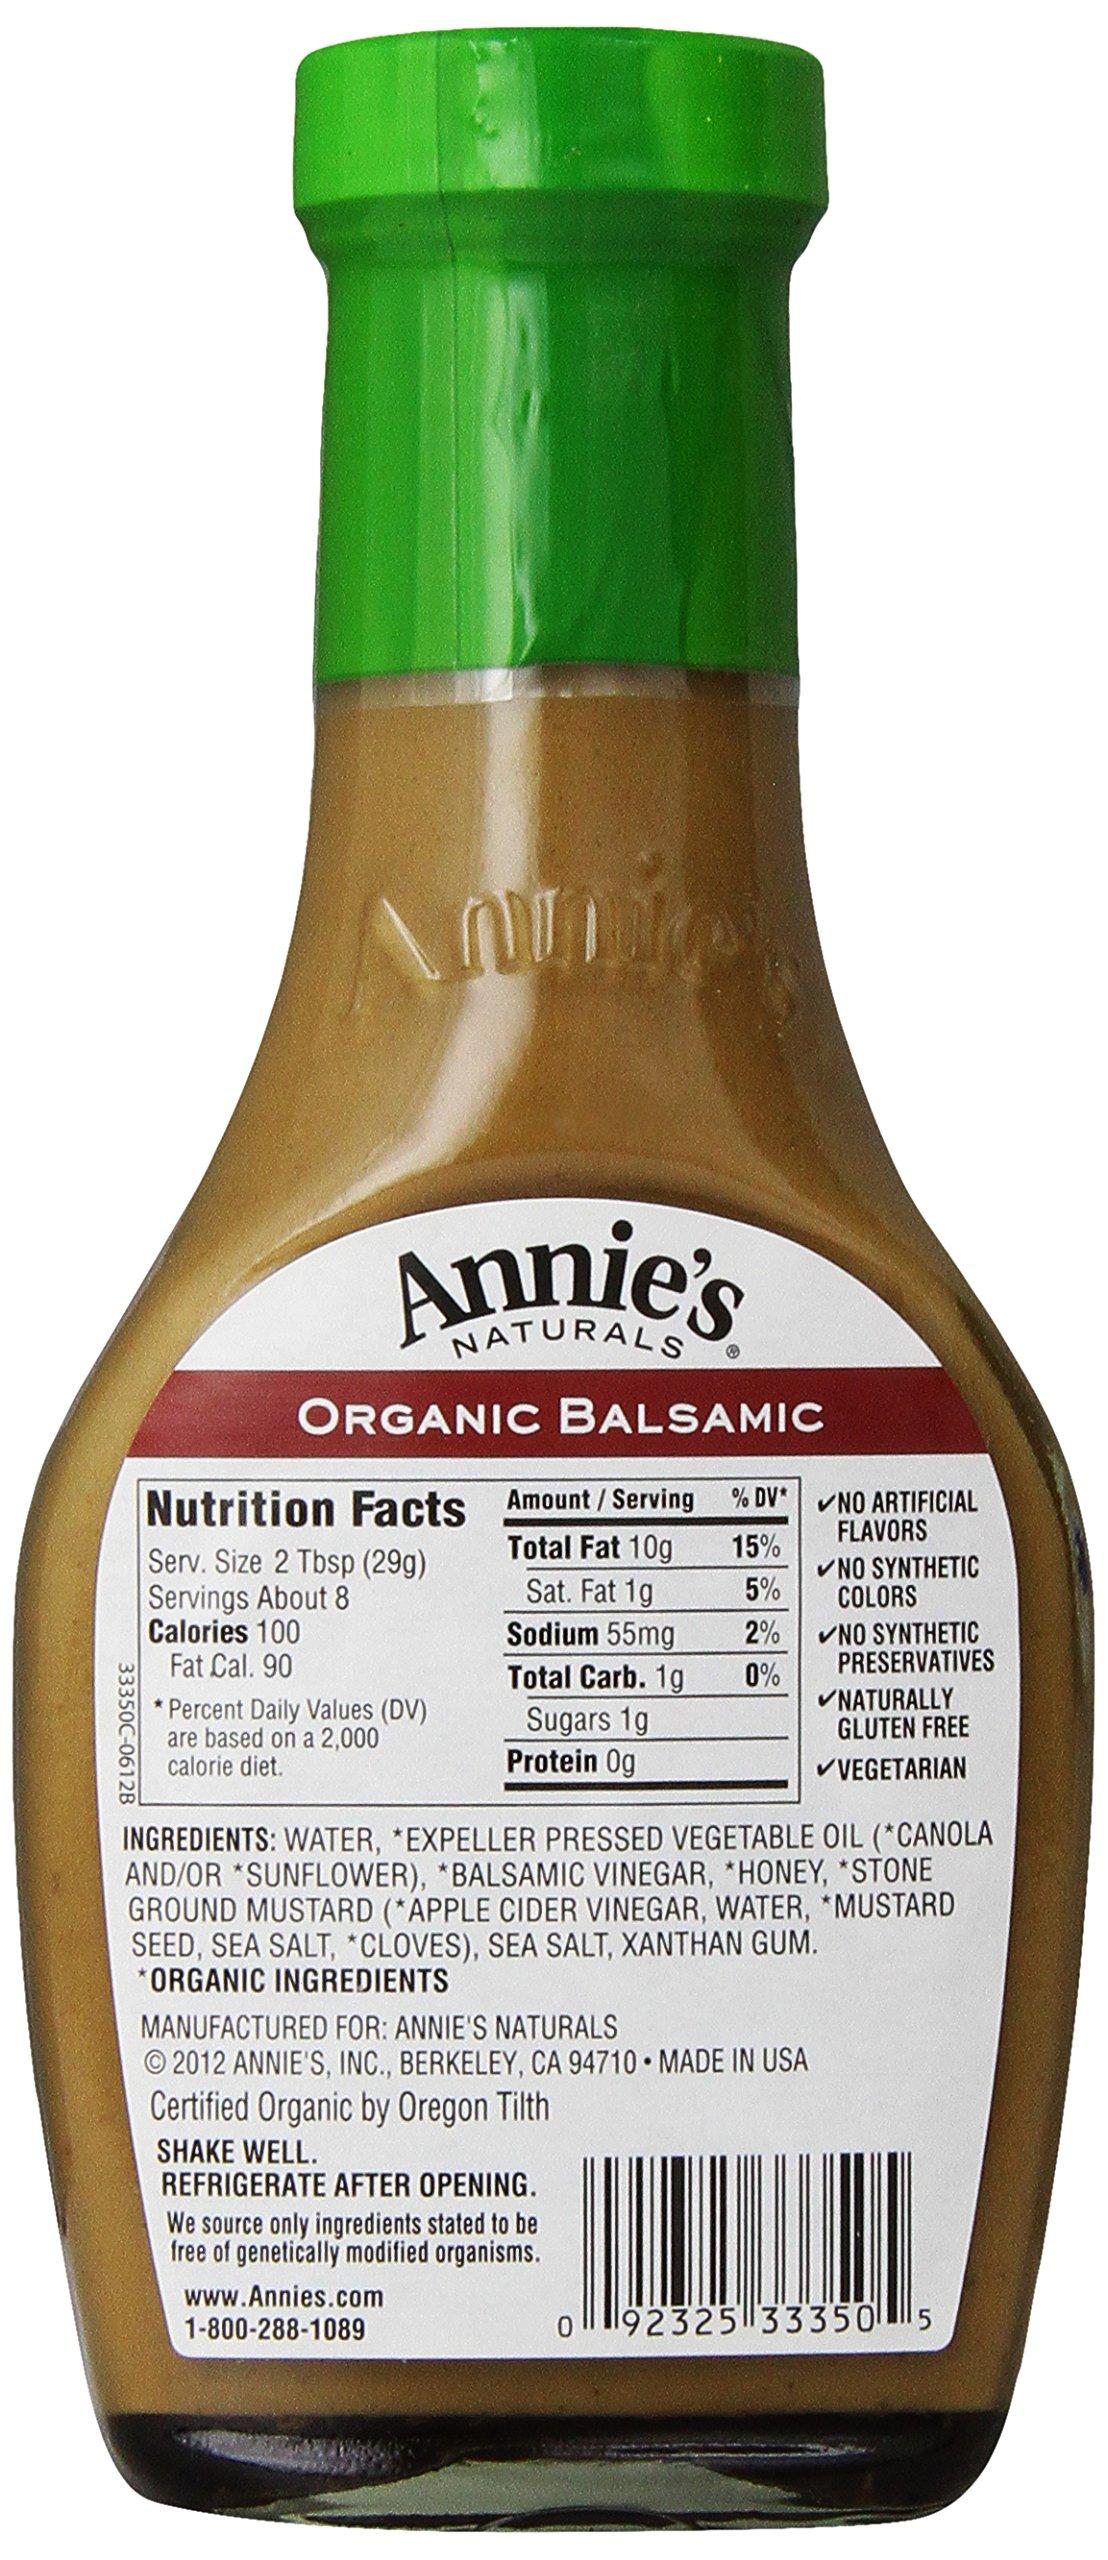 Annie's Organic Gluten Free Balsamic Vinaigrette Dressing 8 fl oz Bottle by Annie's Homegrown (Image #4)